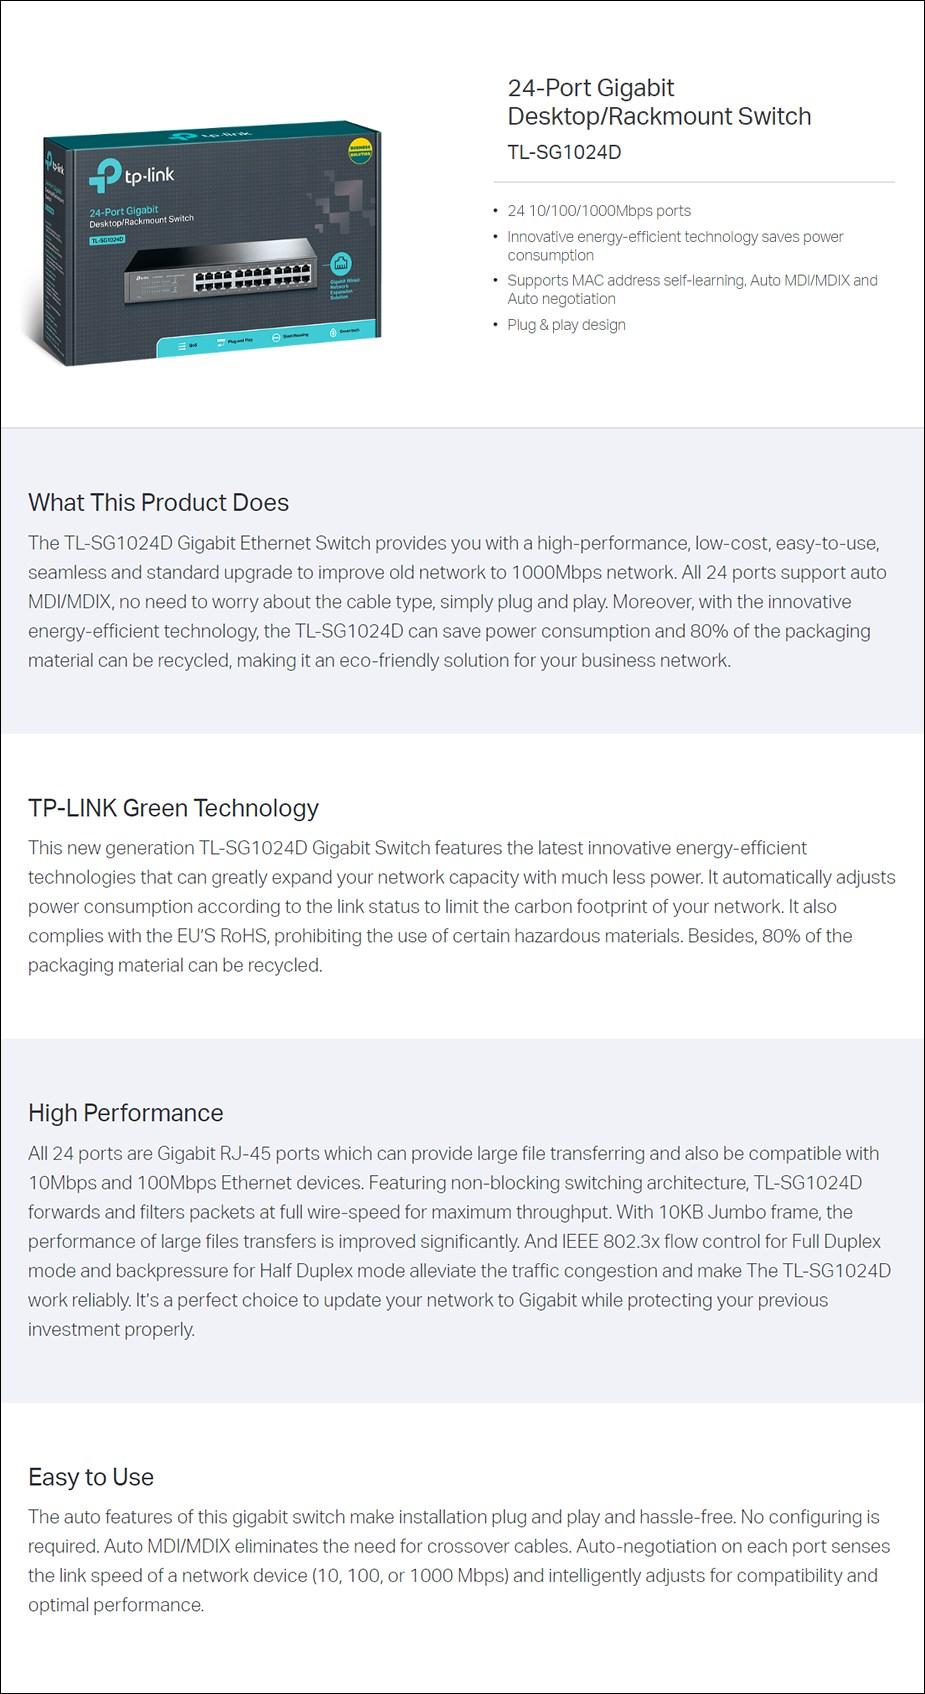 TP-LINK TL-SG1024D 24 Port Gigabit Desktop / Rackmount Switch - Metal Housing - Overview 1